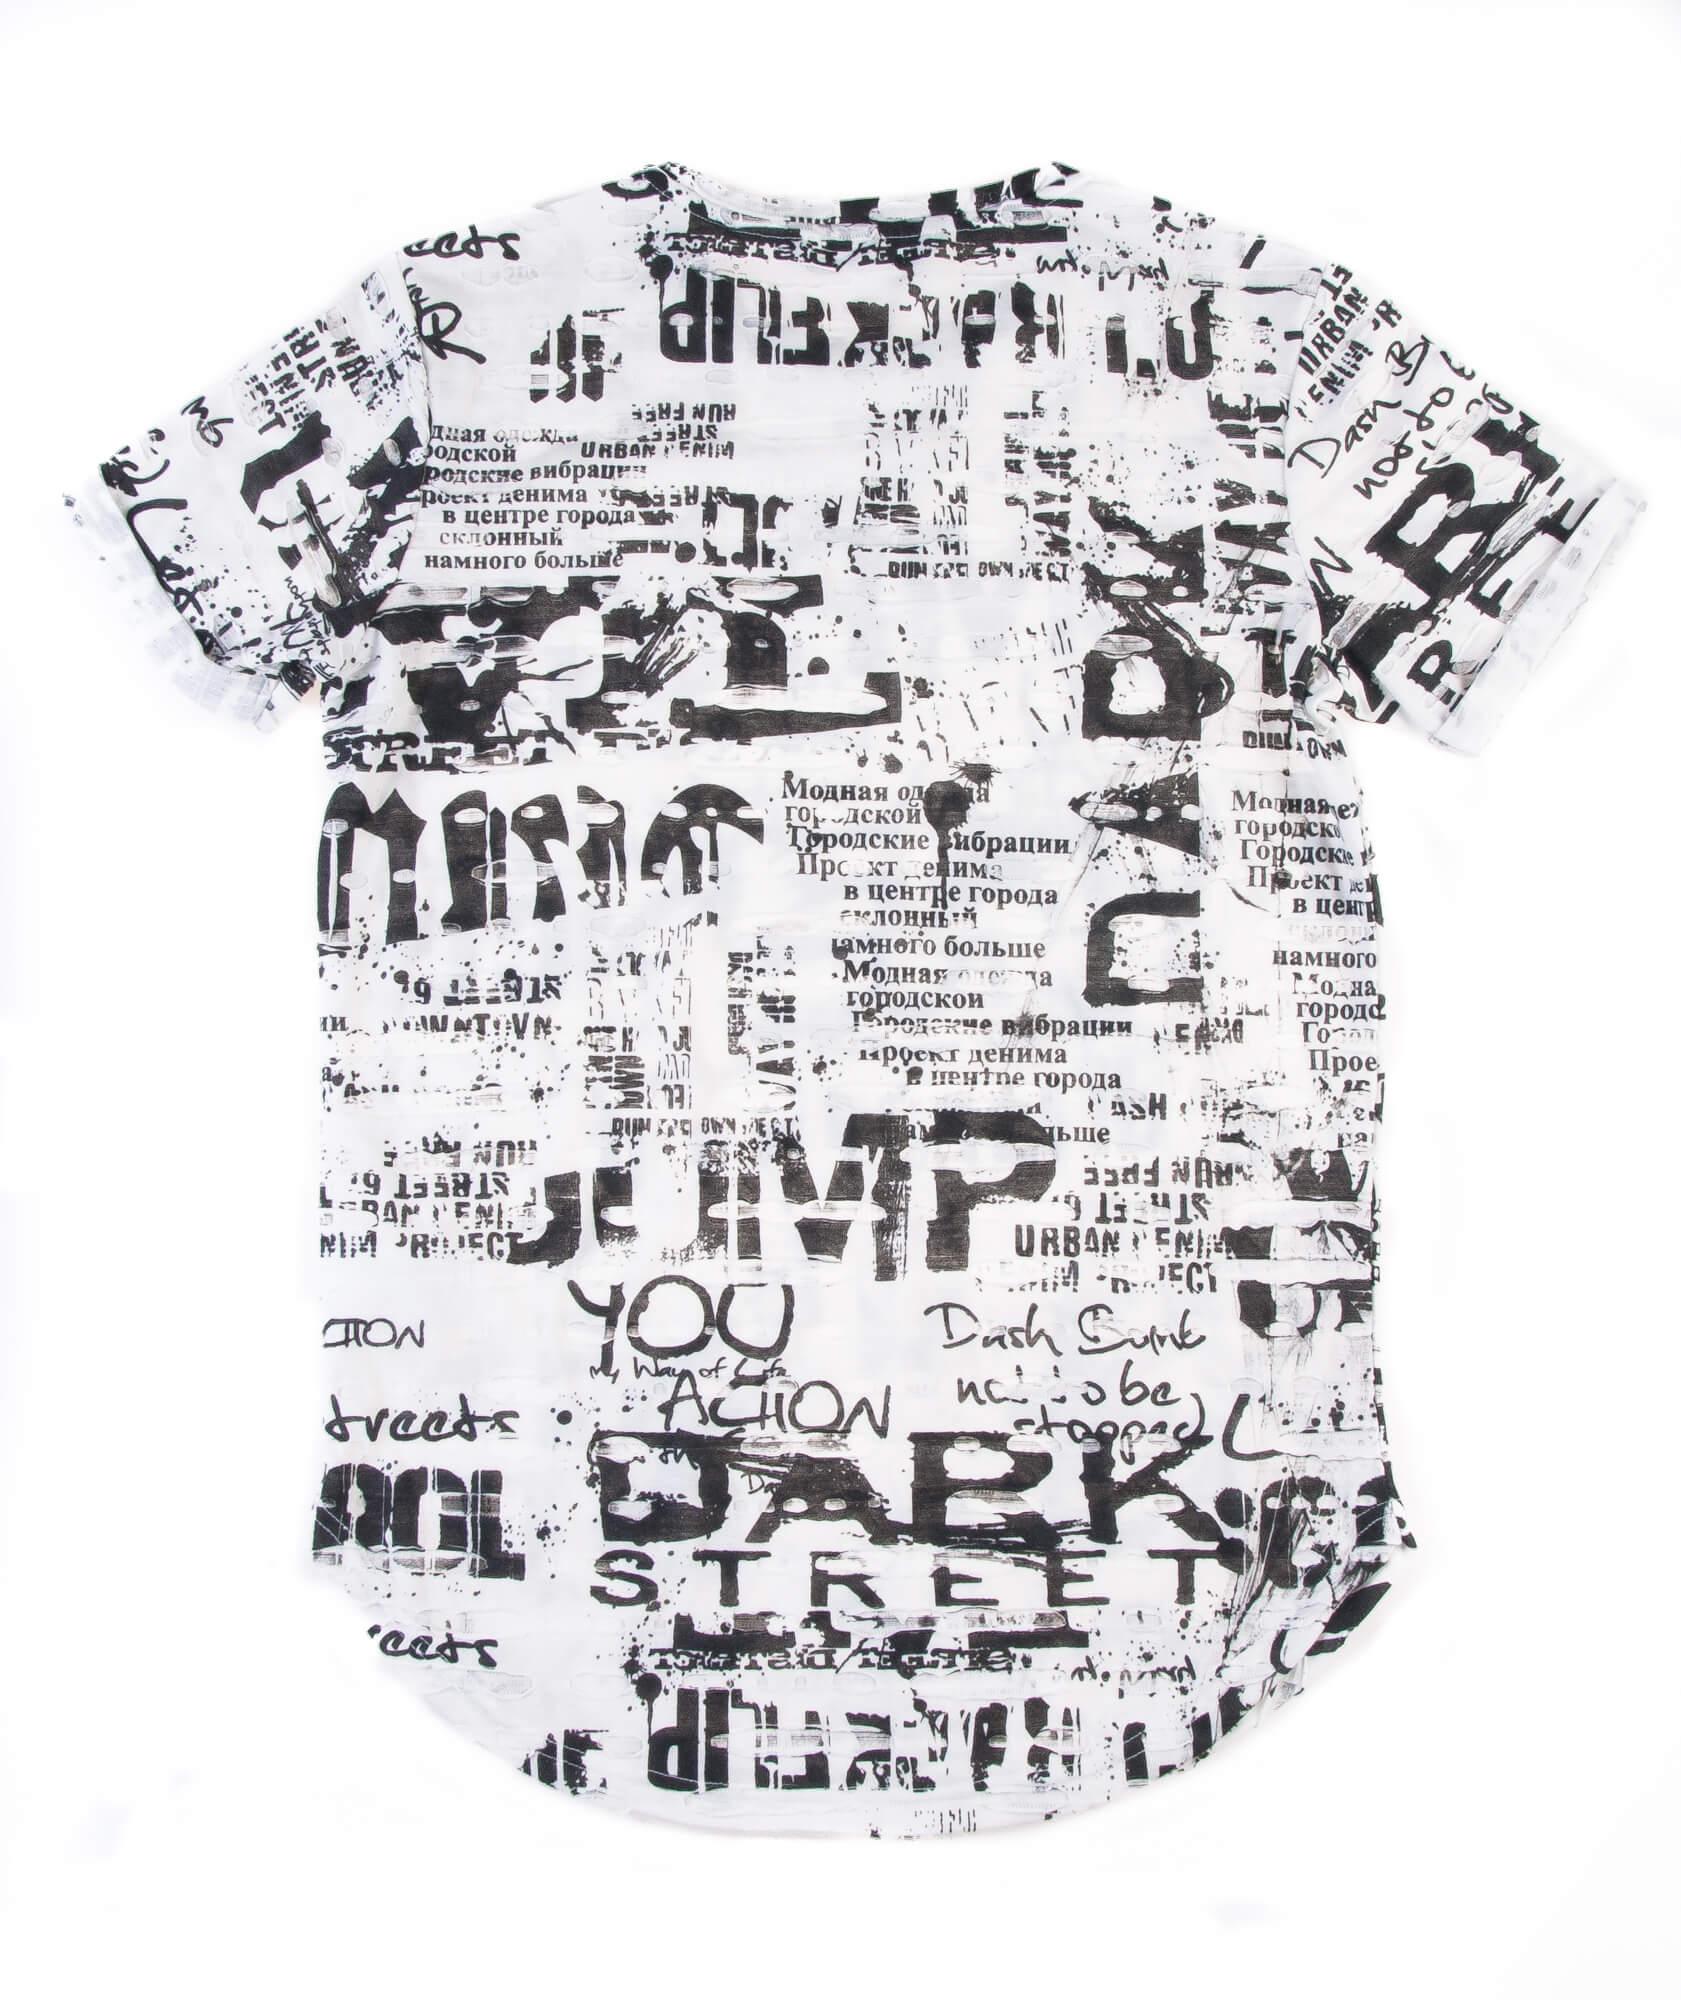 تی شرت مردانه برند ماچ مور S1027- MUCH MORE